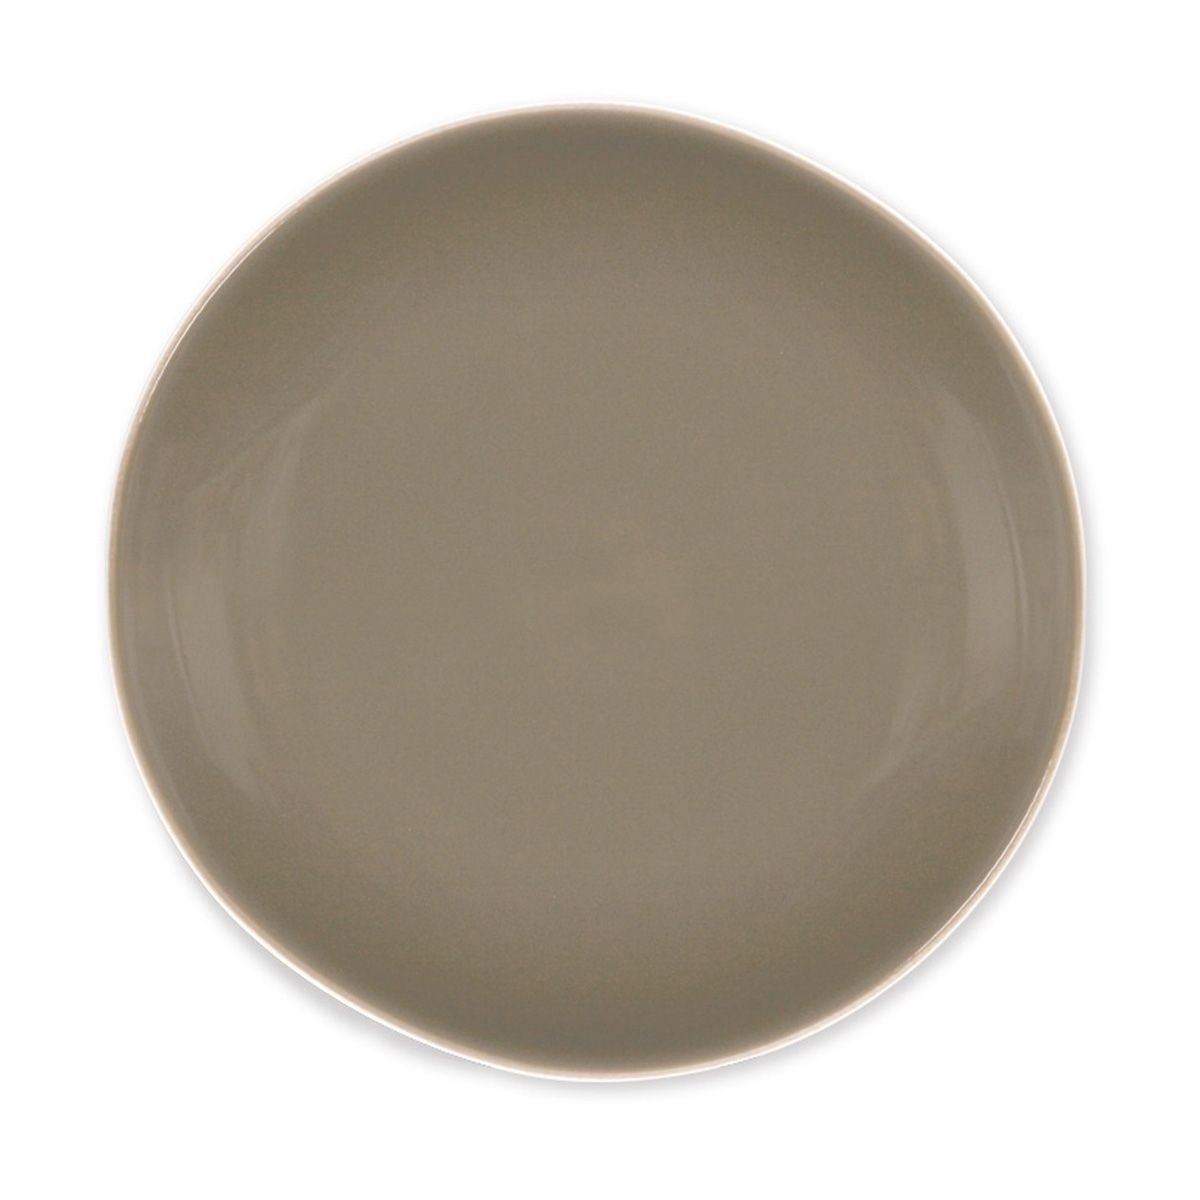 Assiette dessert ronde gr s terana vison bruno evrard for Decoration a l assiette